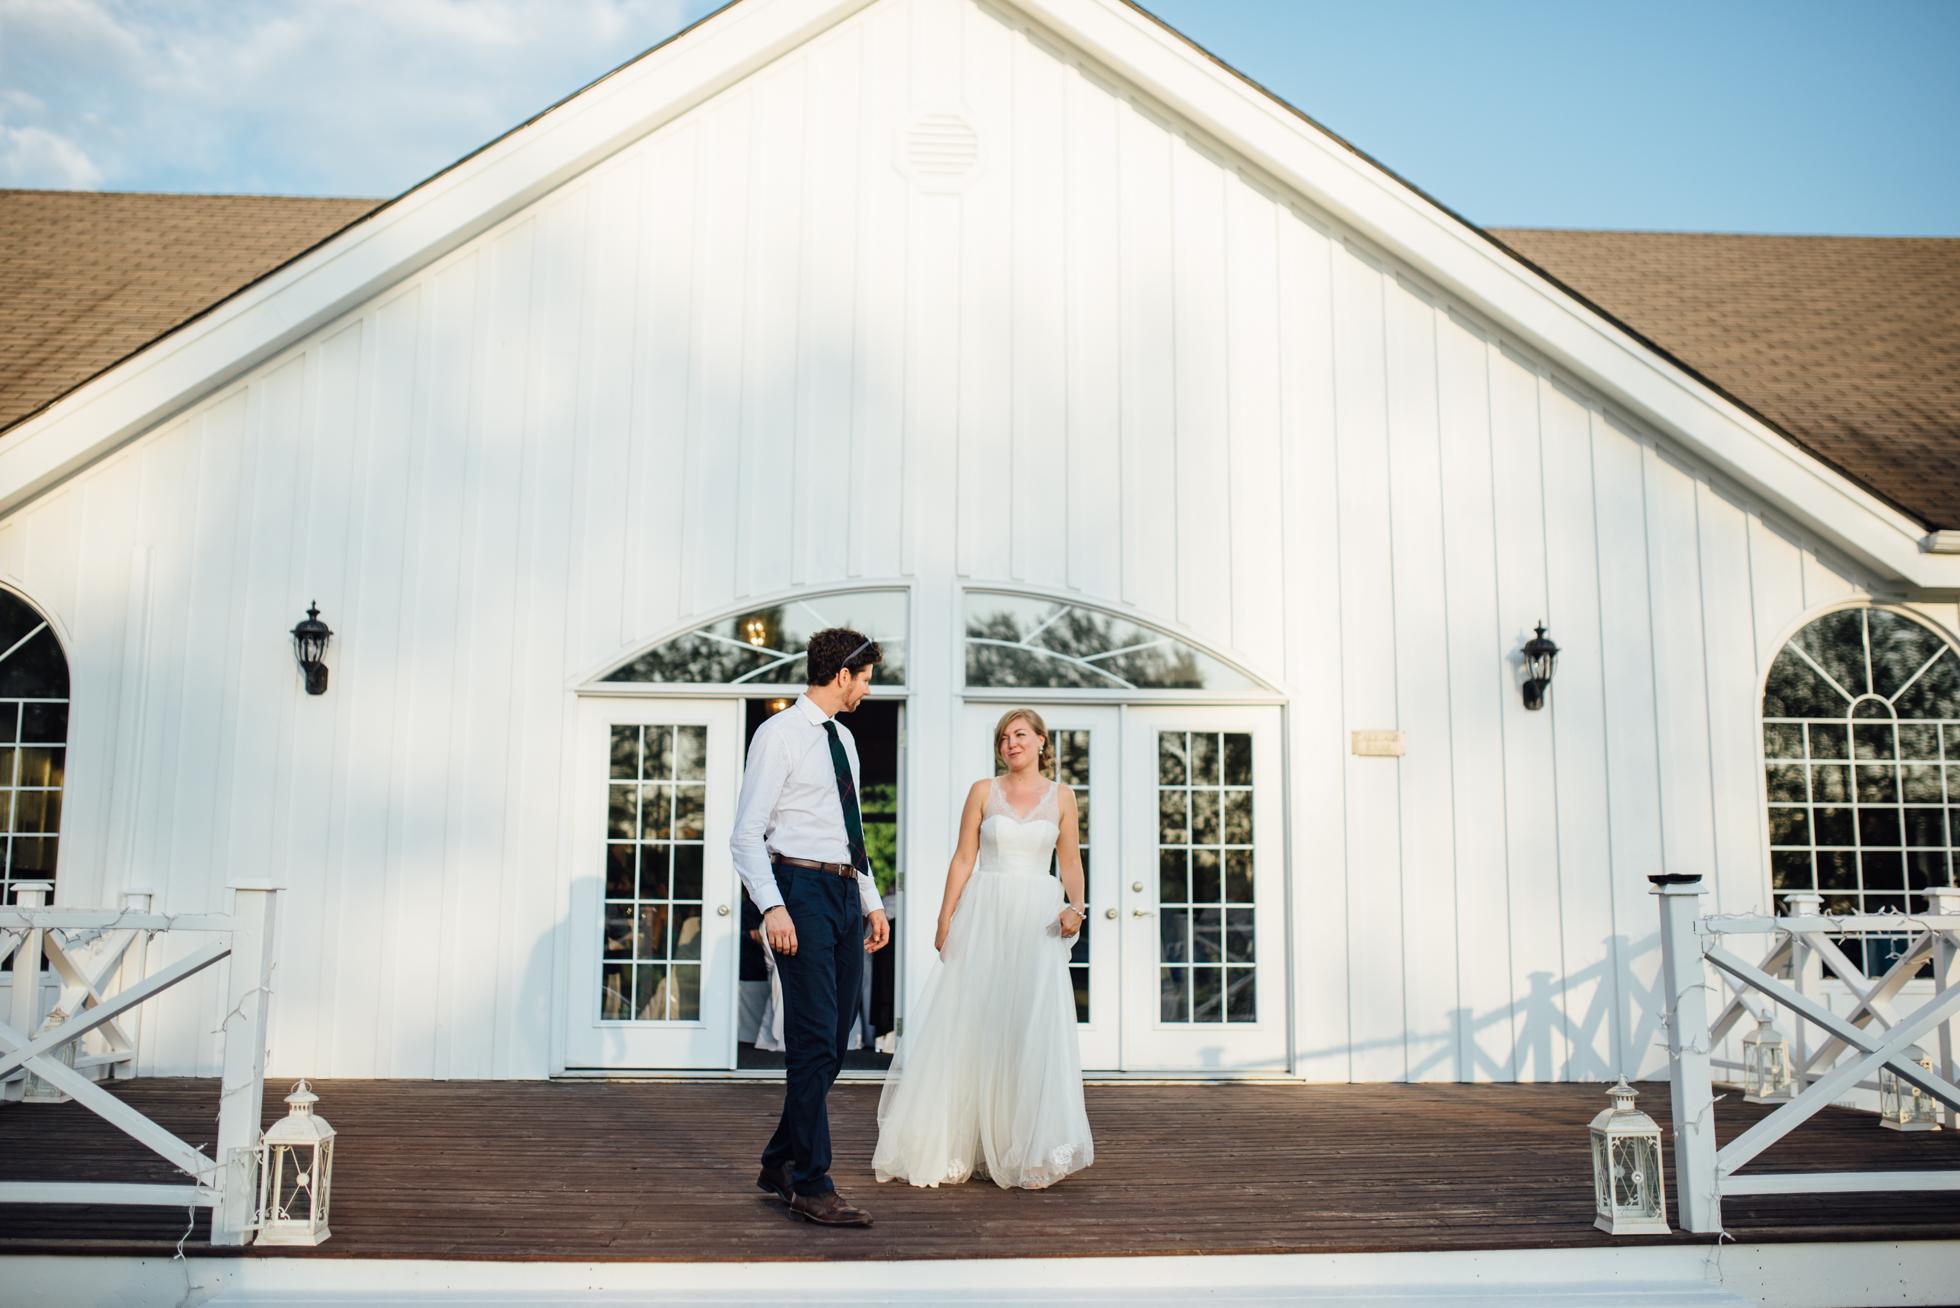 Outdoor-Caledon-Tralee-Wedding-Photography-100